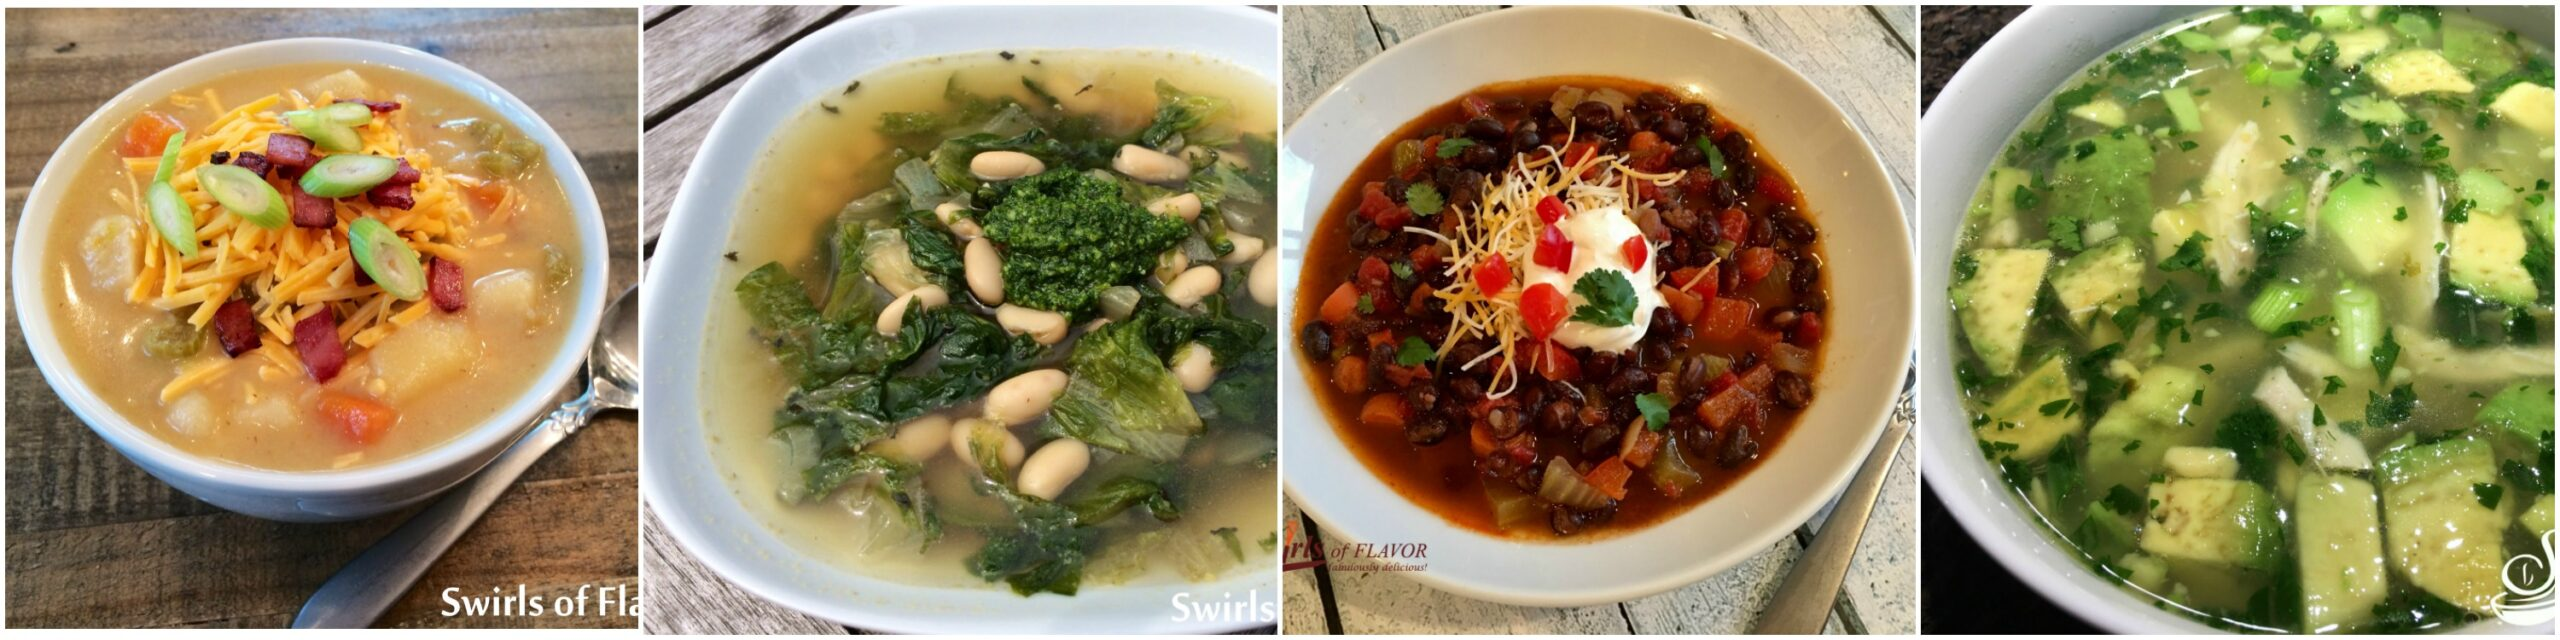 Left to Right: Potato Soup; Escarole and White Bean Soup; Southwest Black Bean Soup; Avocado Lime Chicken Soup